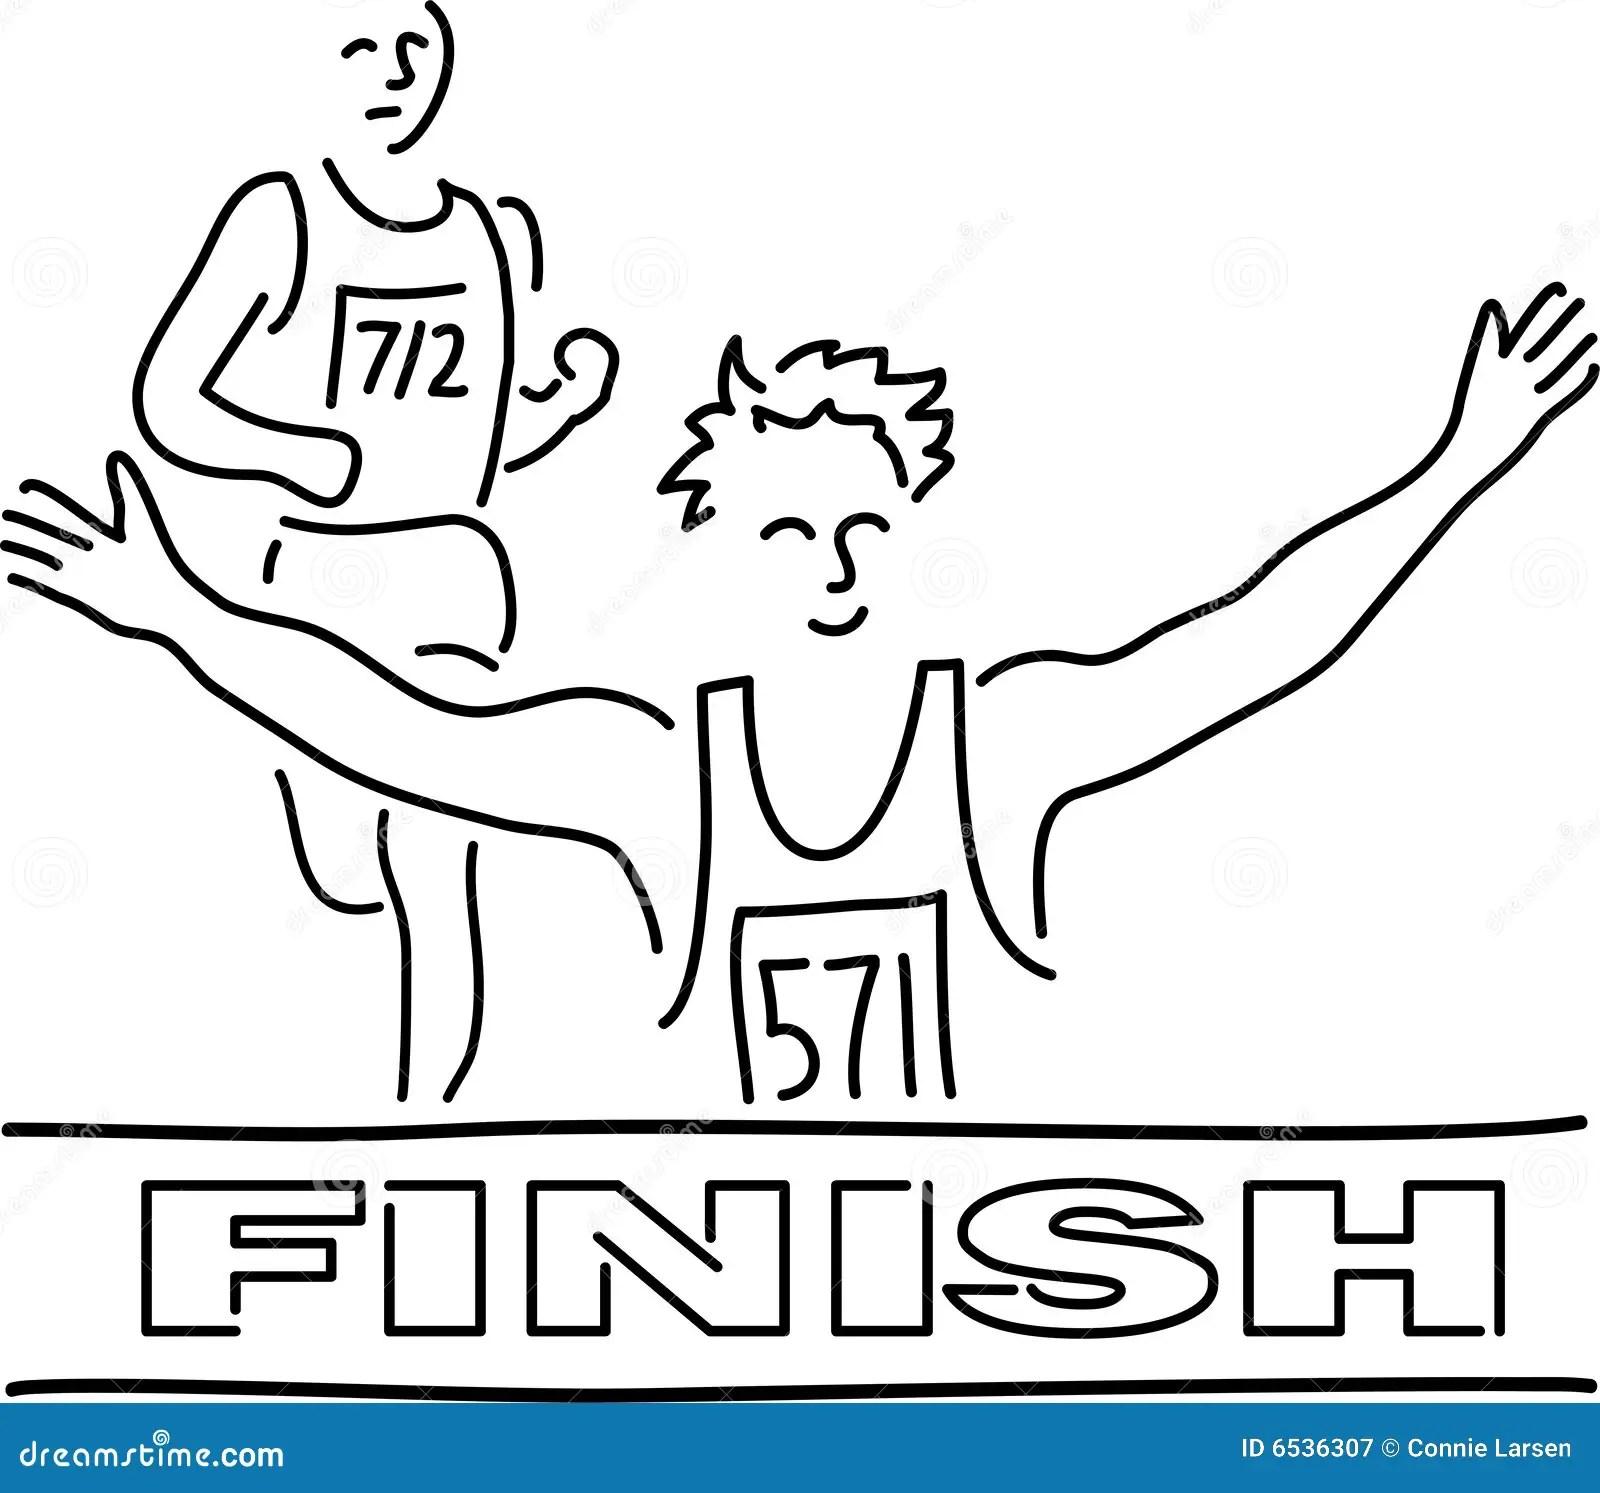 Runners Finish Line Cartoon Stock Illustration